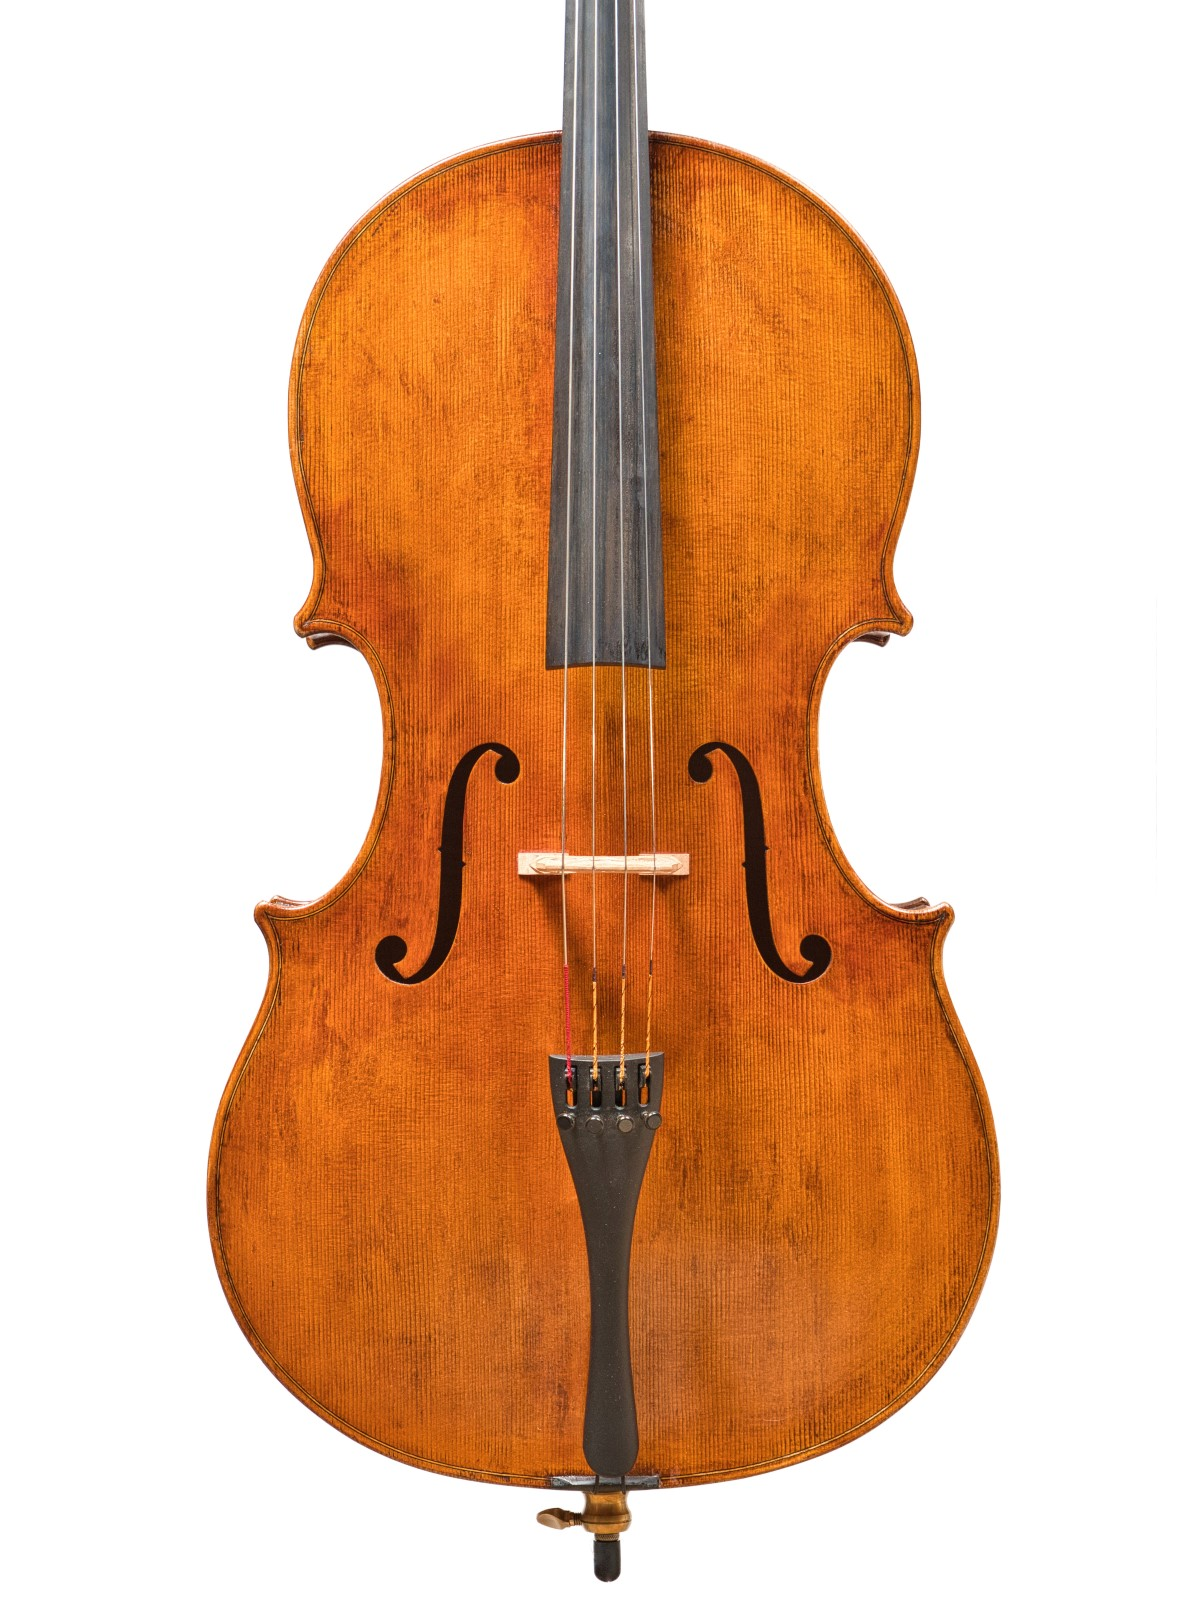 Cello by Yael Rosenblum Ex-Harrell Montagnana, 2020